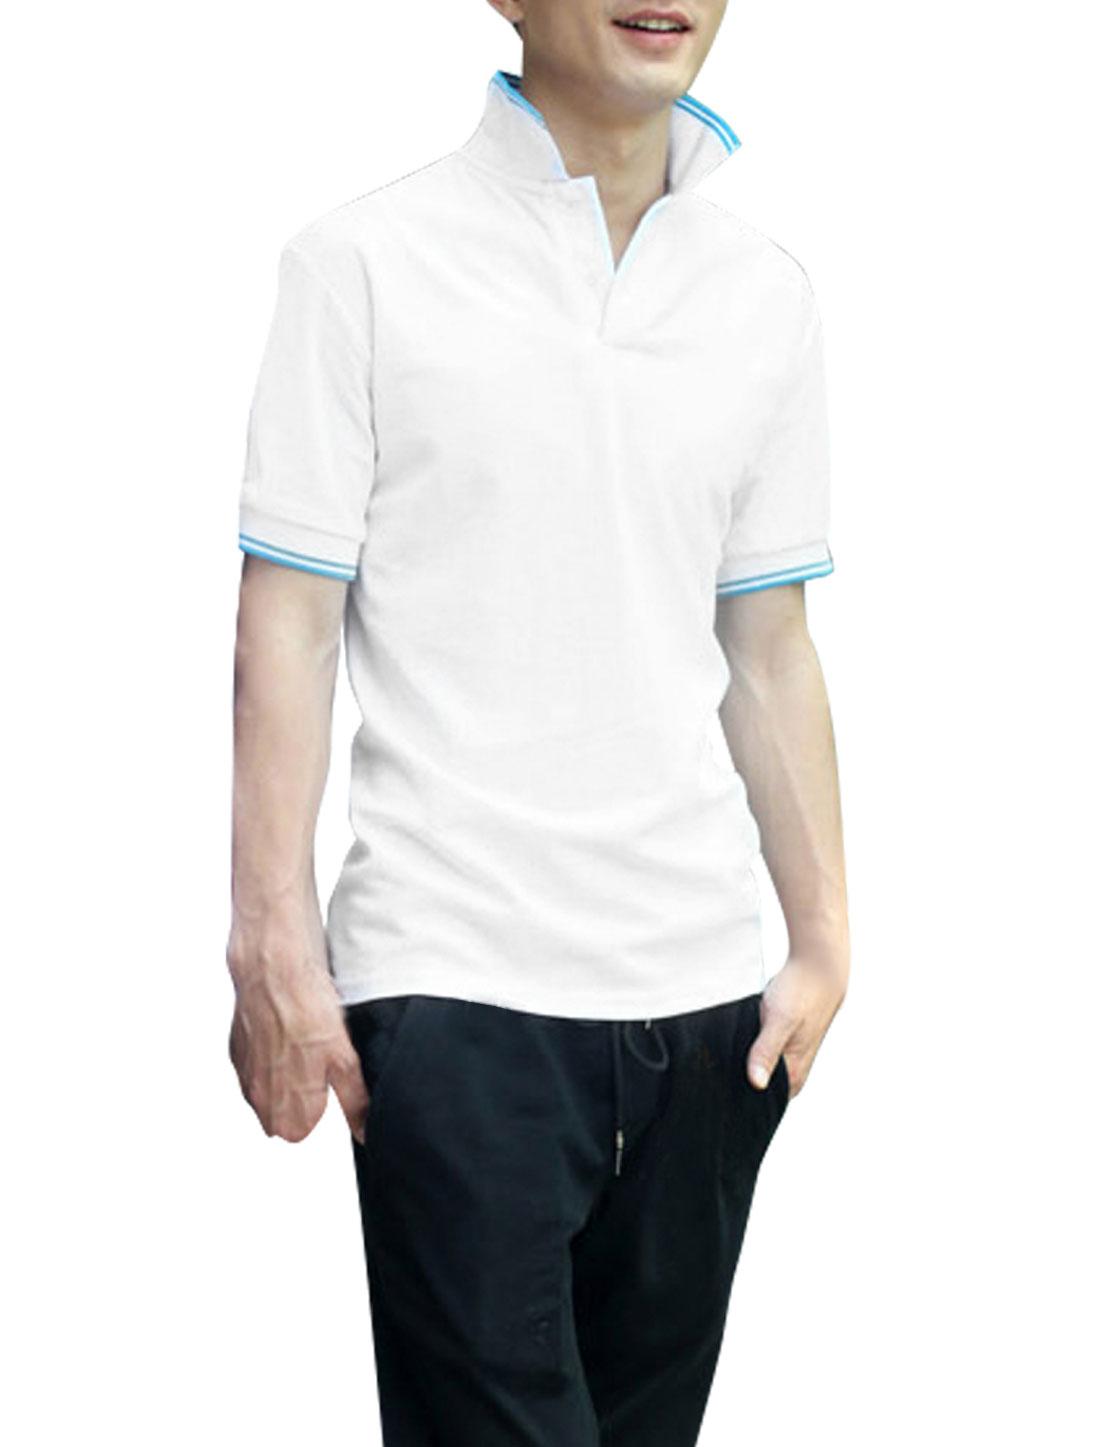 Men Convertible Collar Short Sleeve Stripes Detail Shirt White L